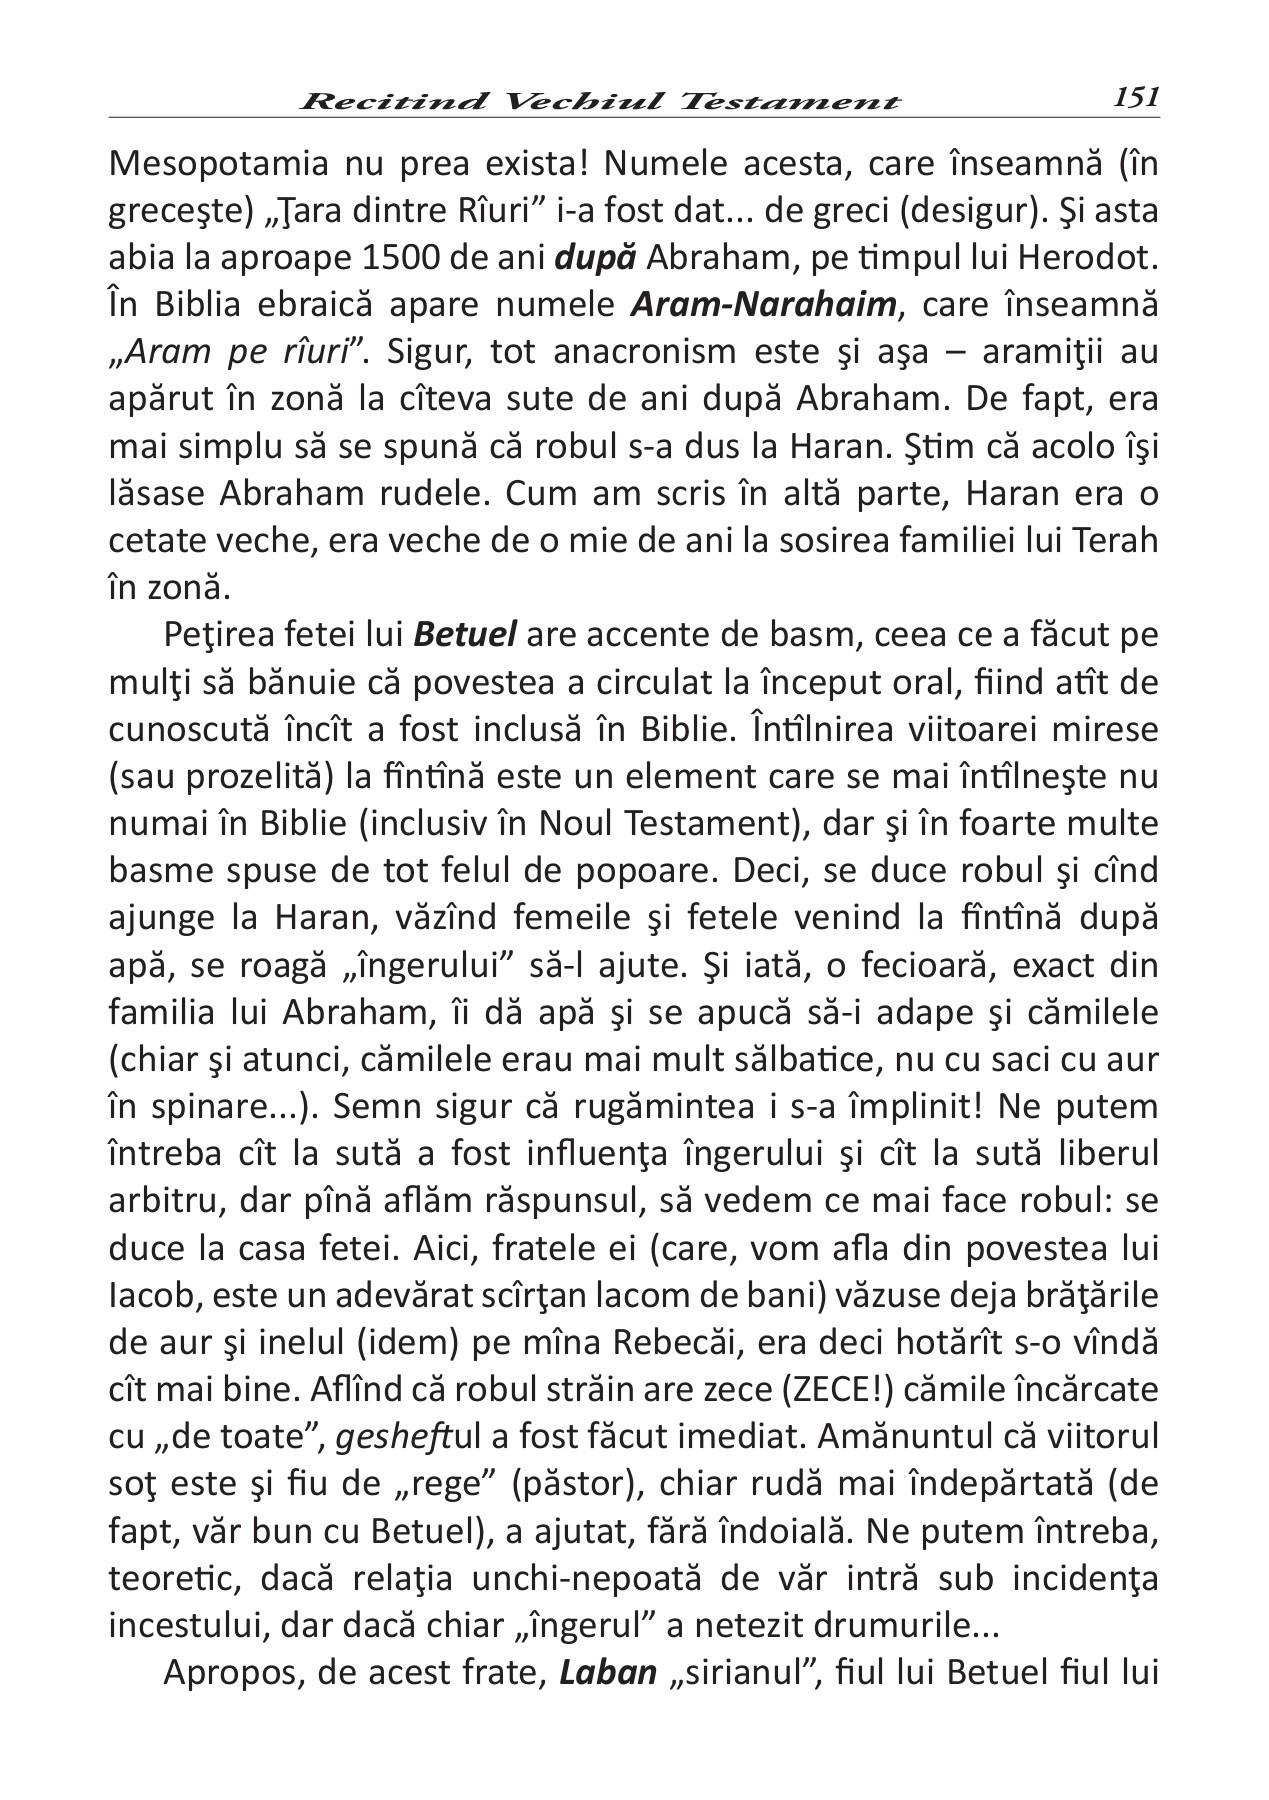 Recitind Vechiul Testament, Autor Nick Sava Pages 151  200 in Calendarul Lunar Pentru Sanatate Si Frumusete